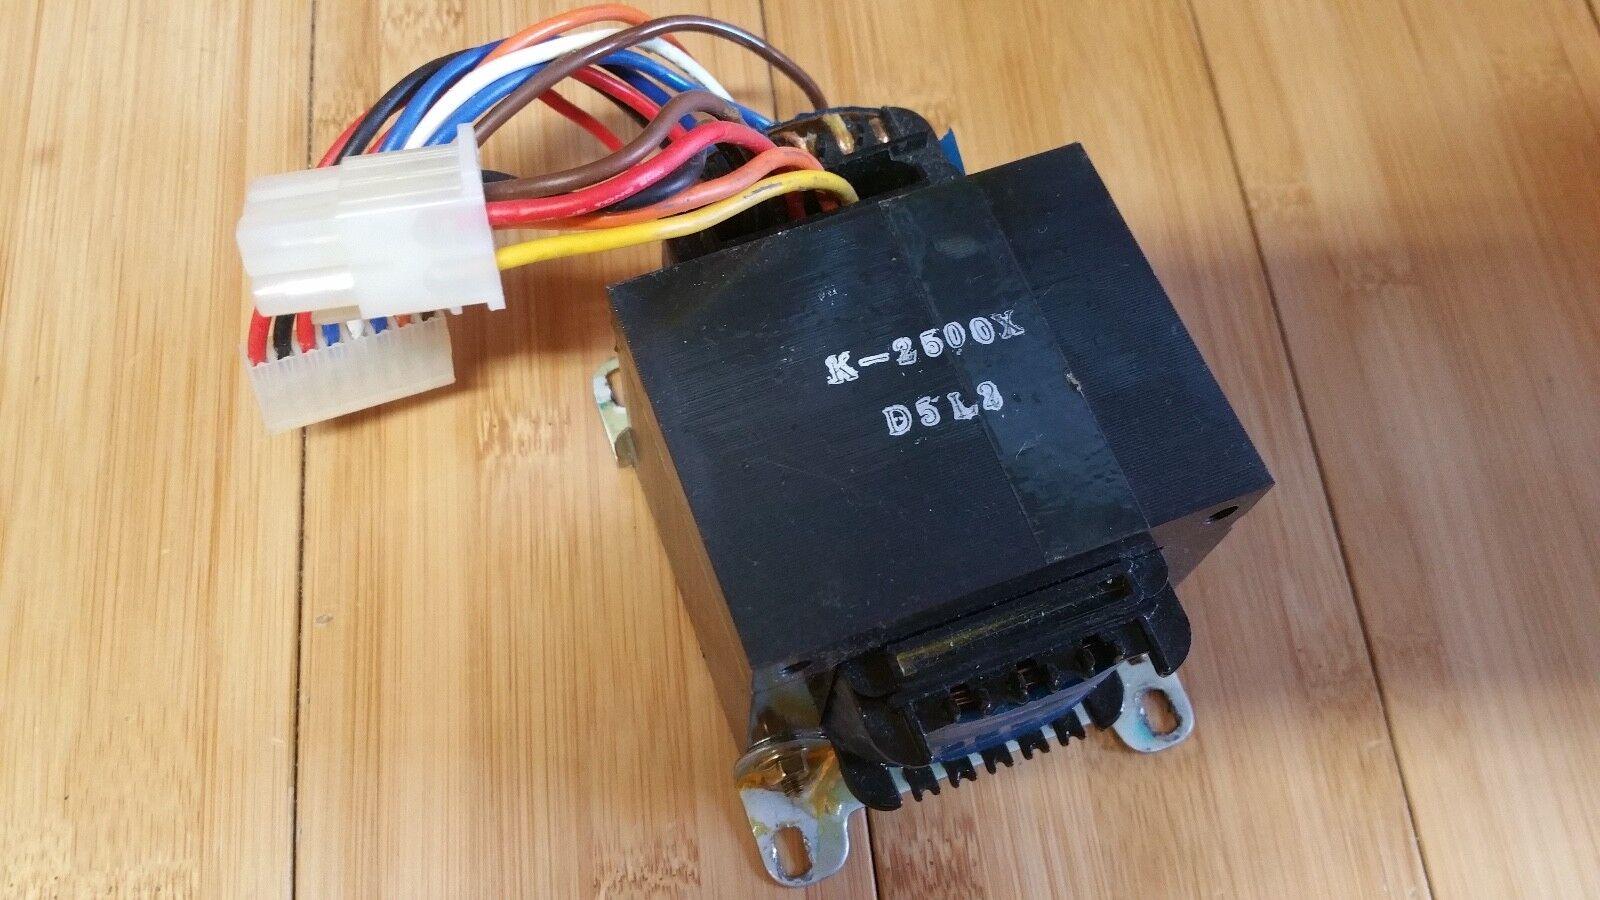 Kurzweil K2500X K 2500 X D5L2 Unit - Power inlet plugs into this